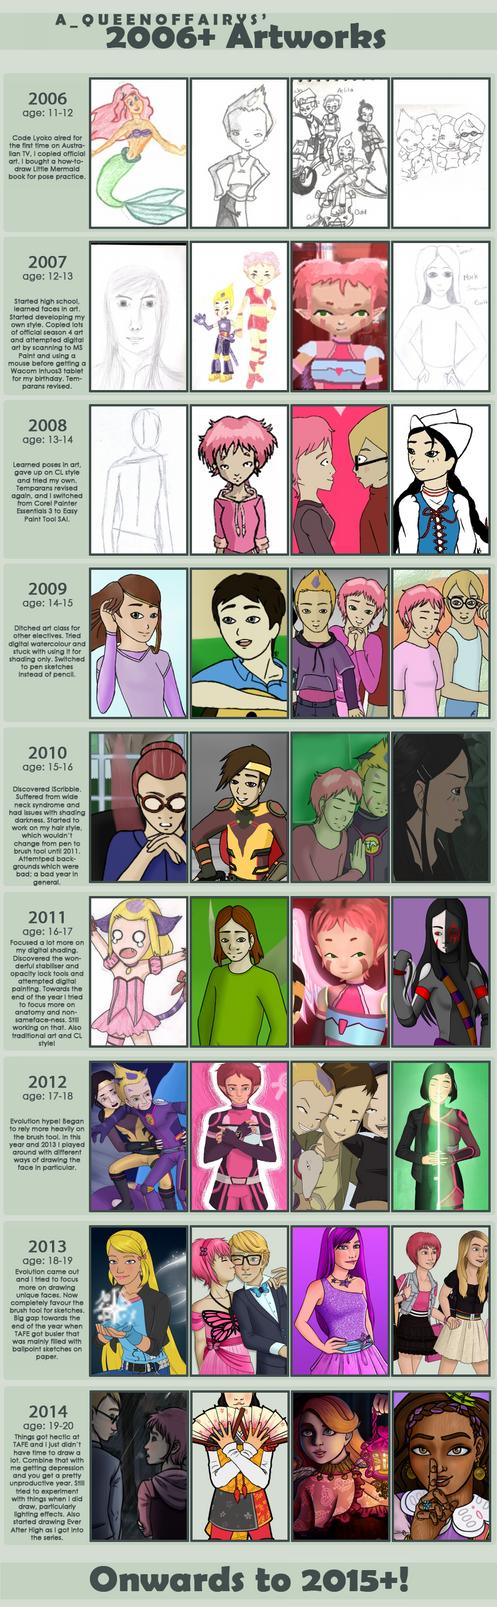 Improvement Meme by A-queenoffairys